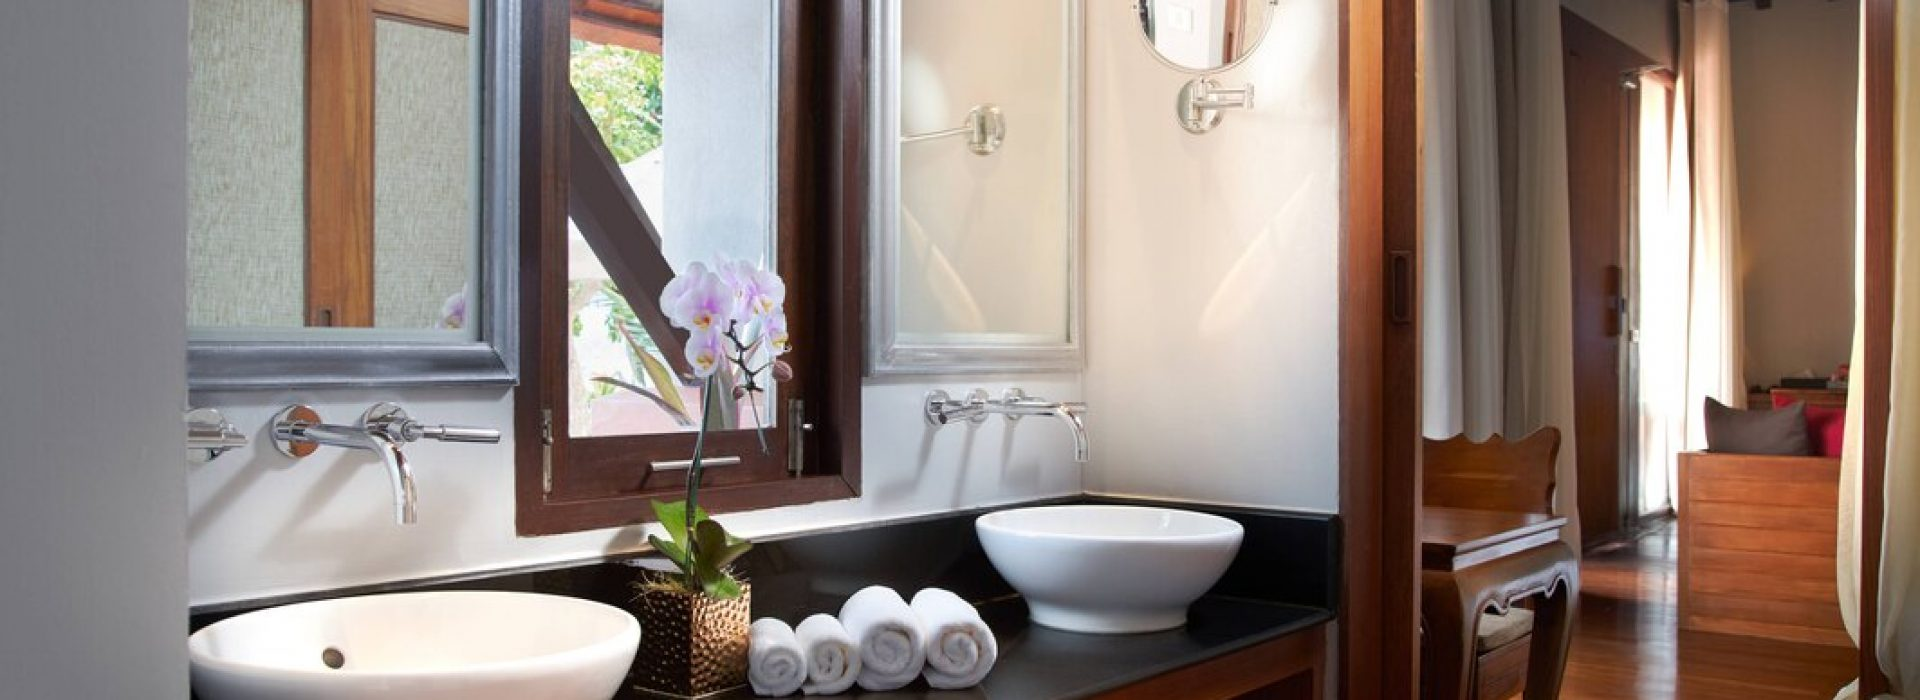 usmbr-private-bathroom-9339-hor-wide